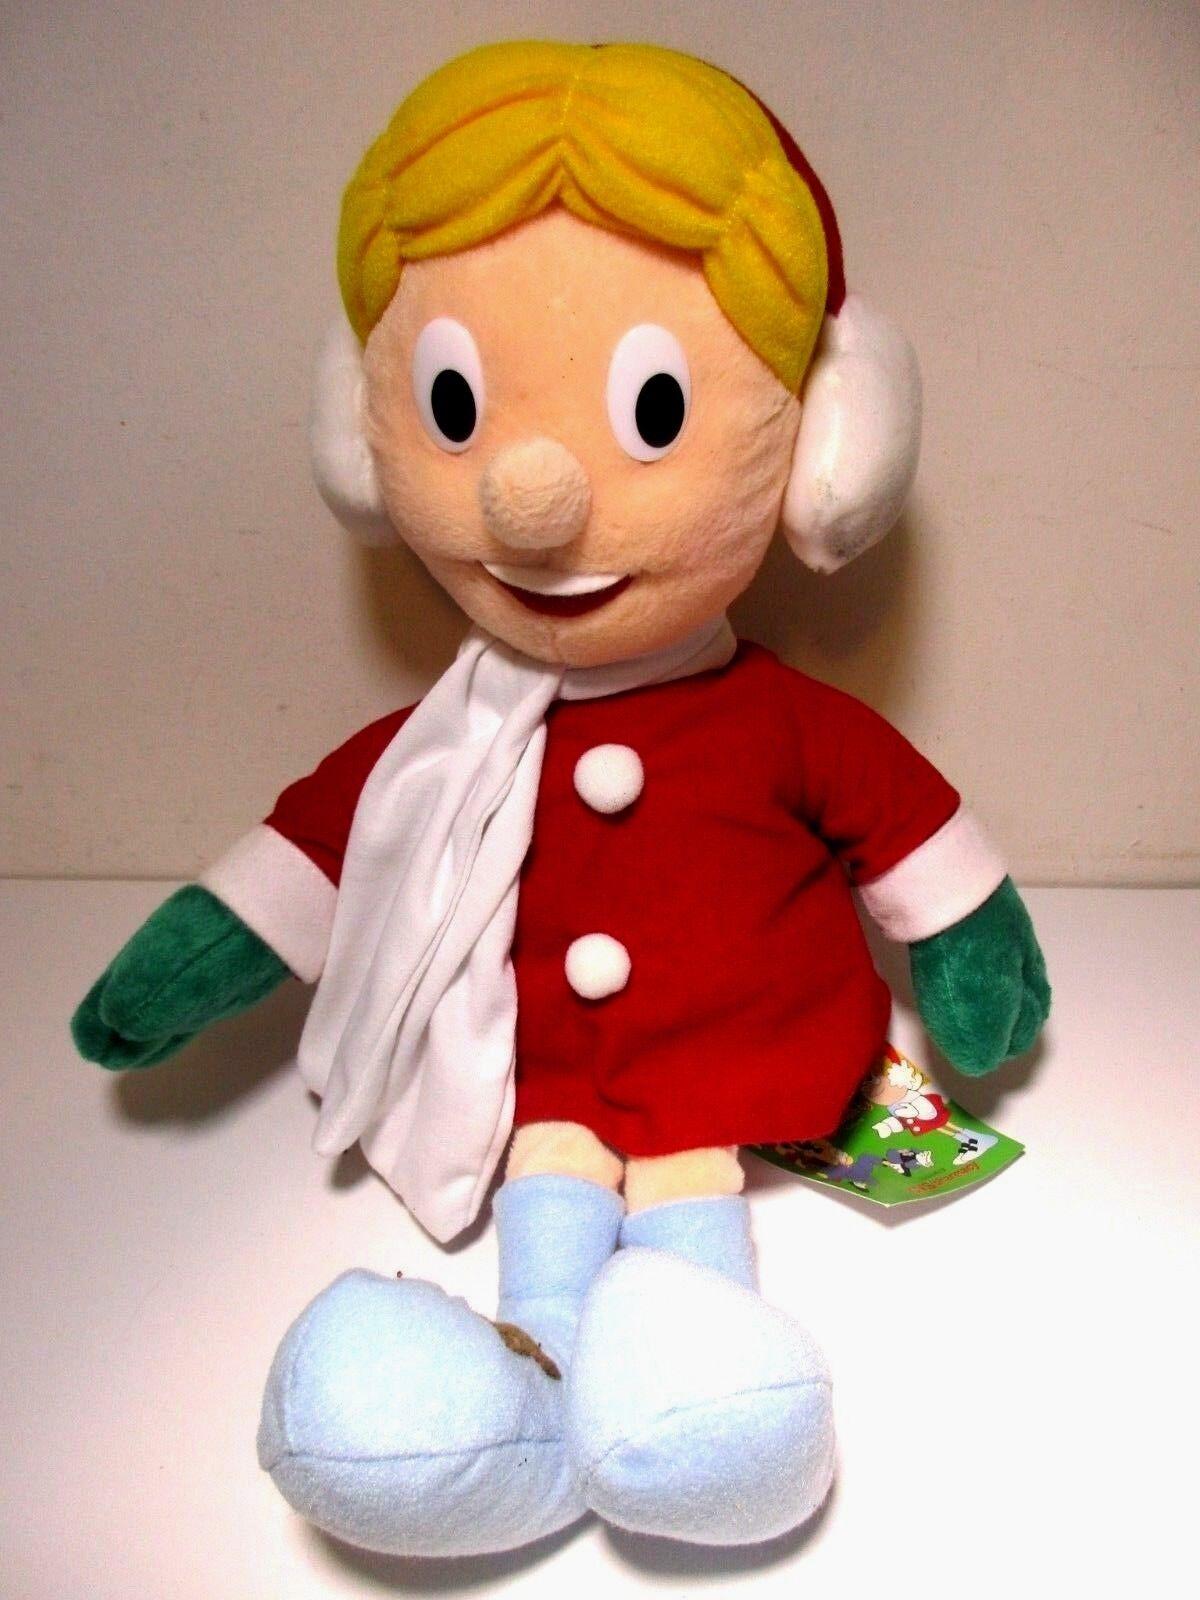 12  14  CVS Stuffins Frosty The Snowman Karen Plush Stuffed Toy Doll